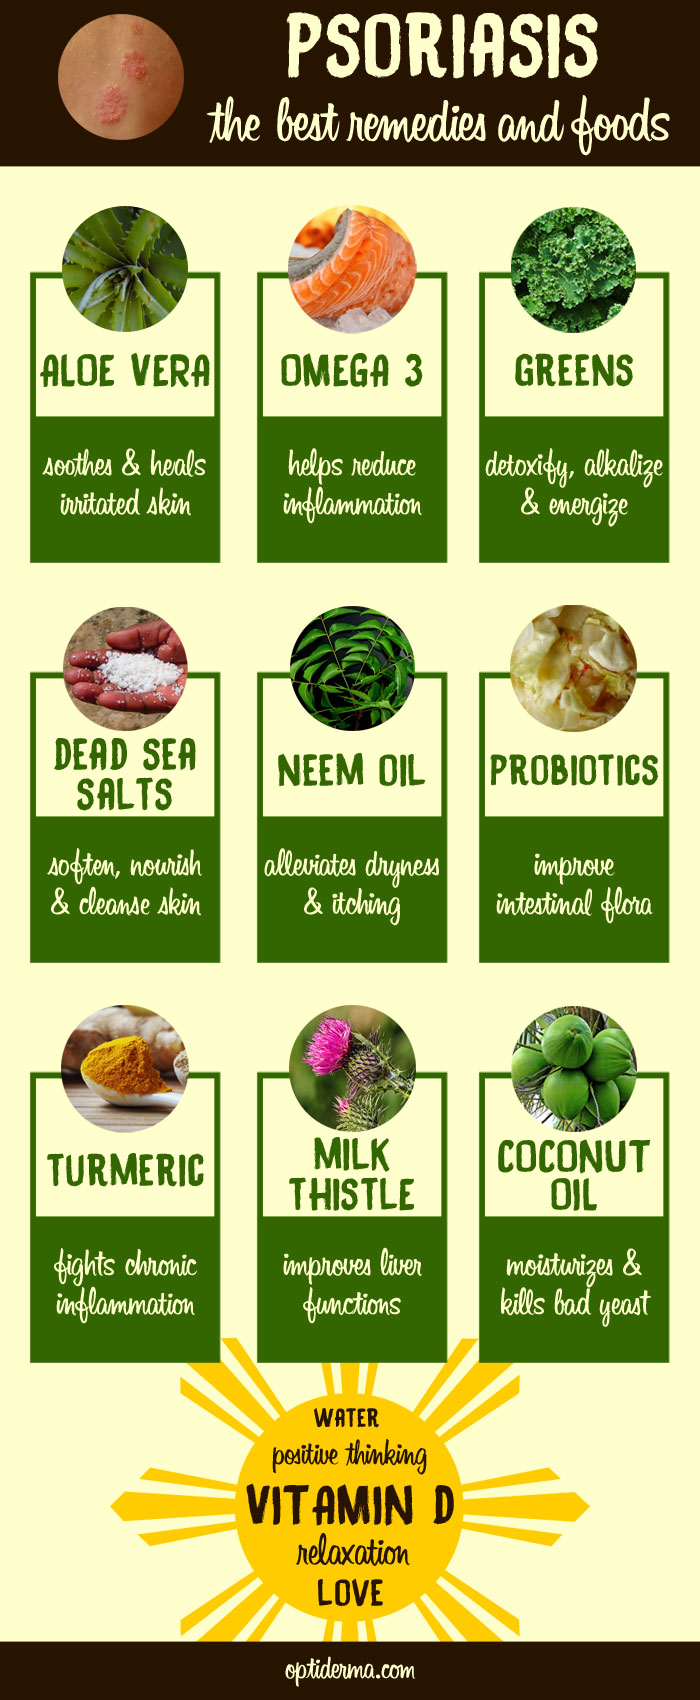 Psoriasis Diet That Works